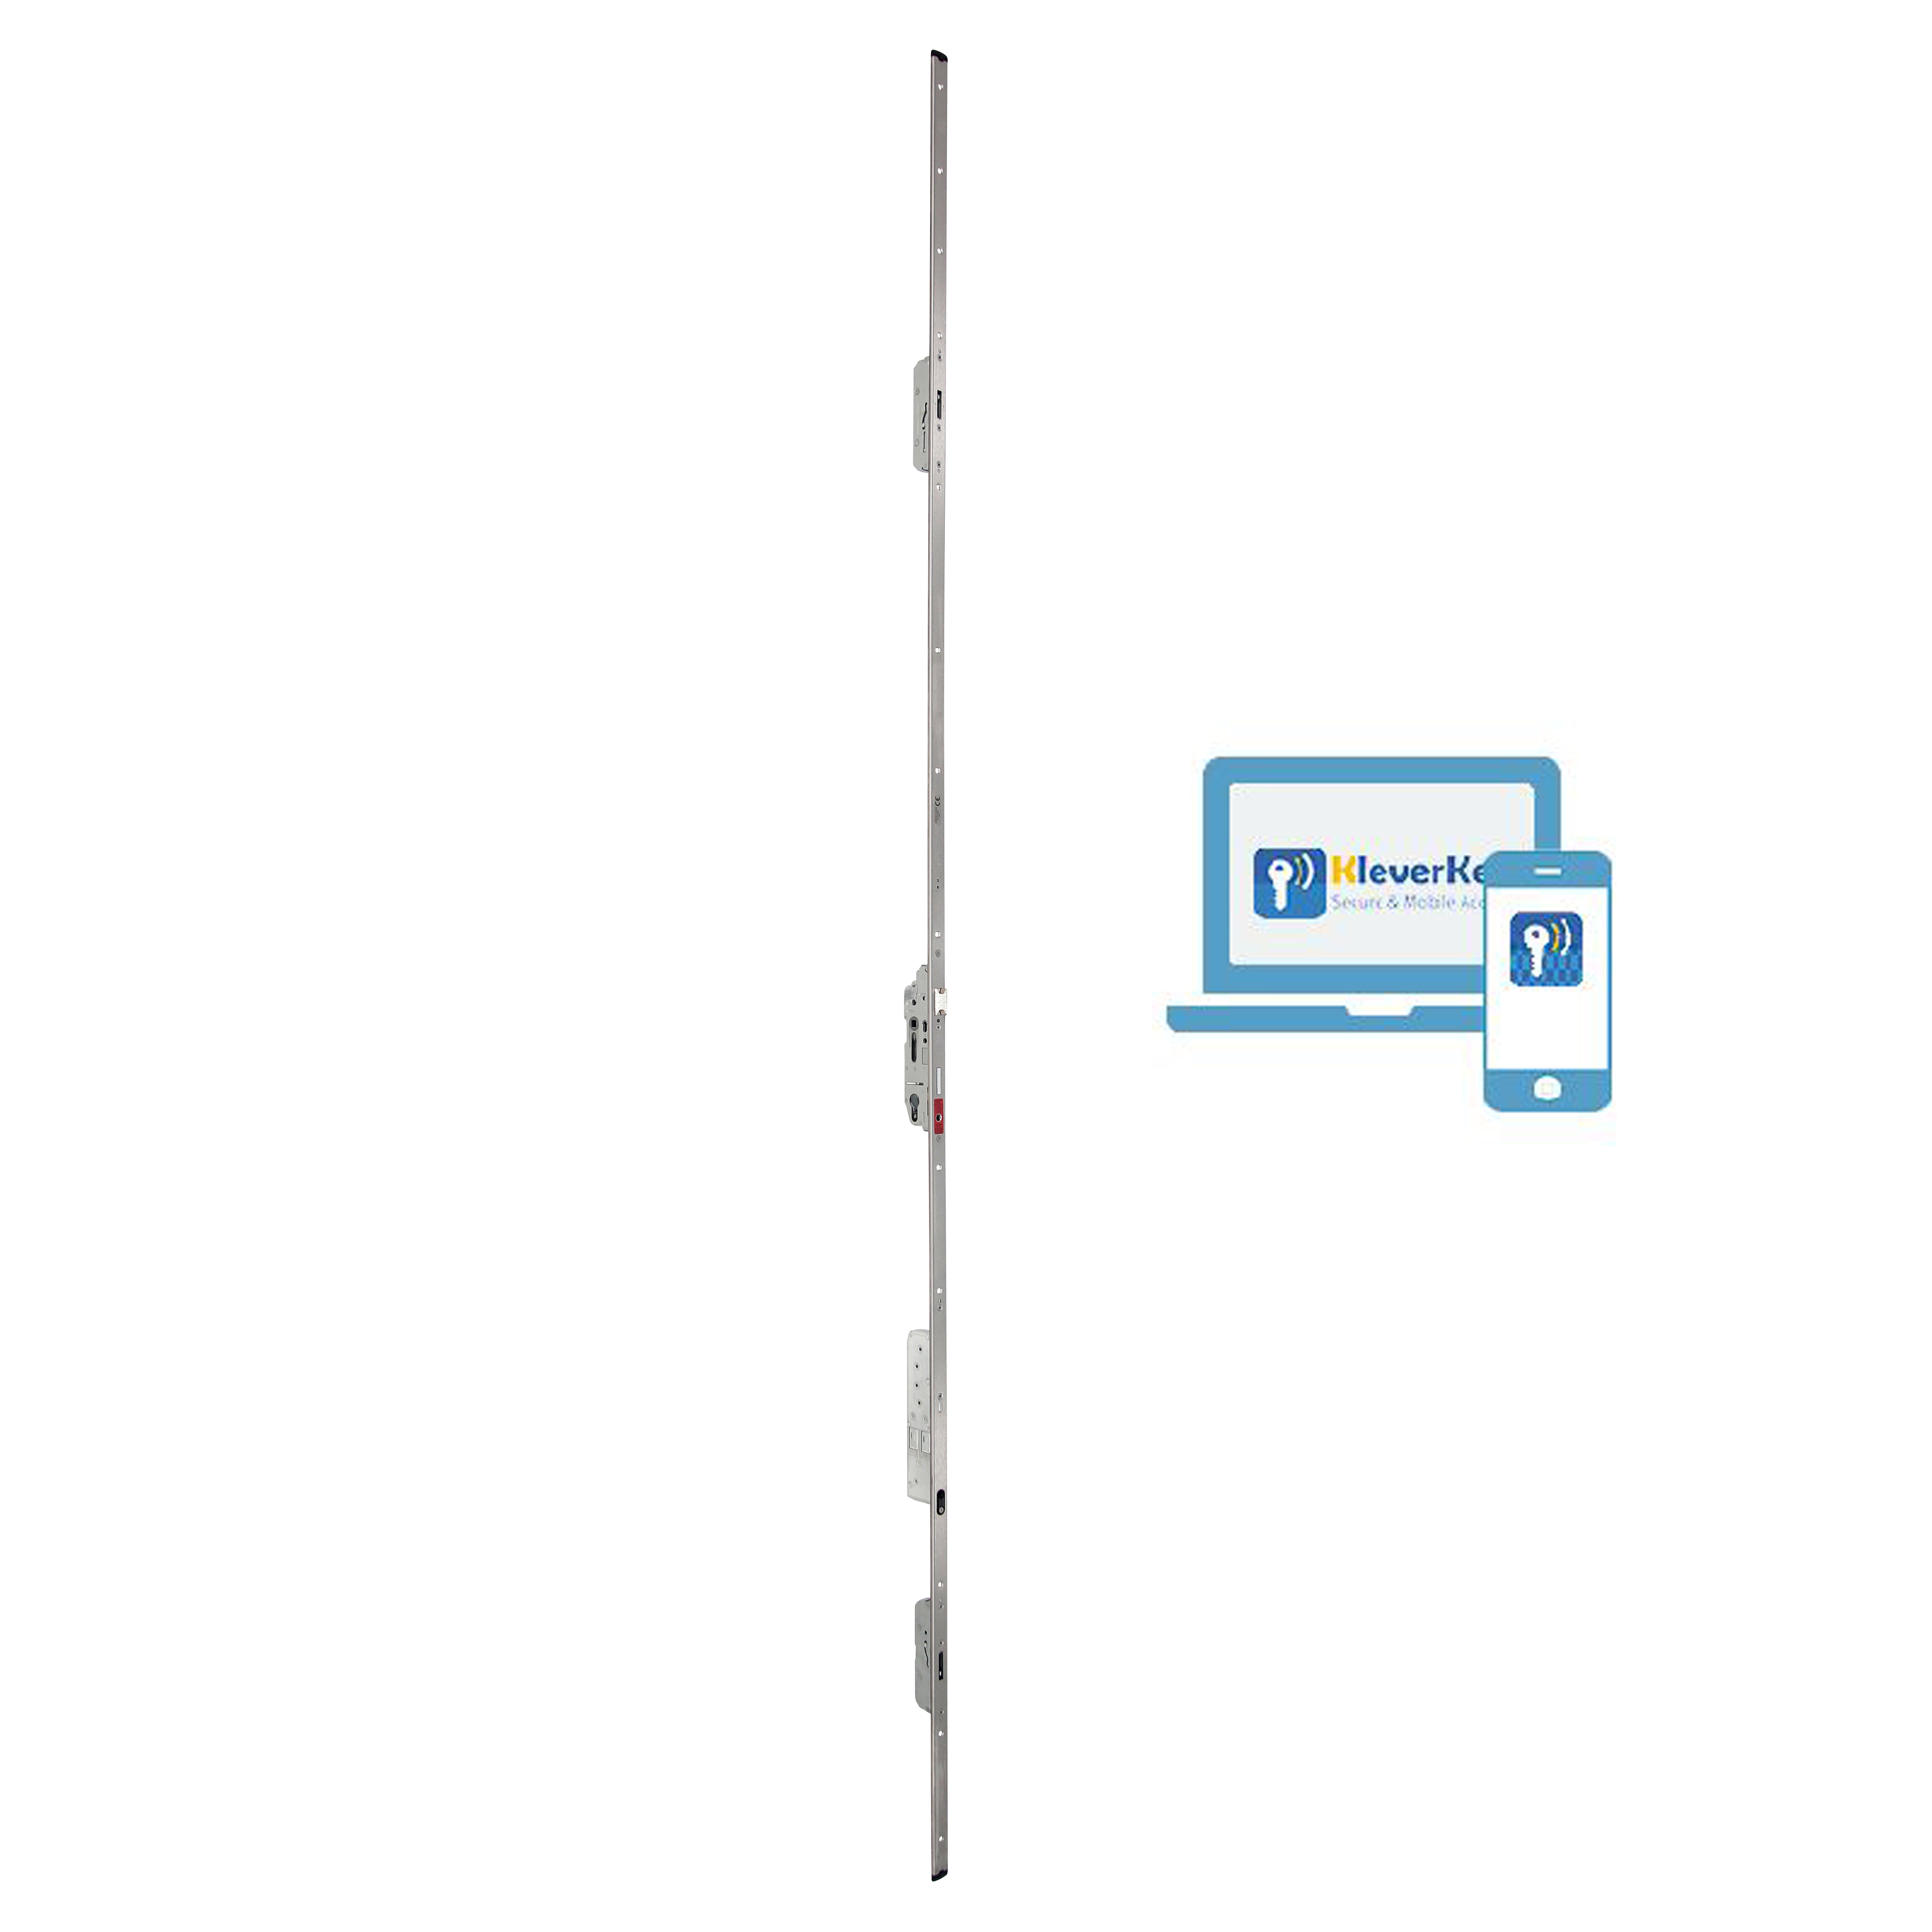 BeSMRT E-mps PC72 DM65 VP24x1700 mm